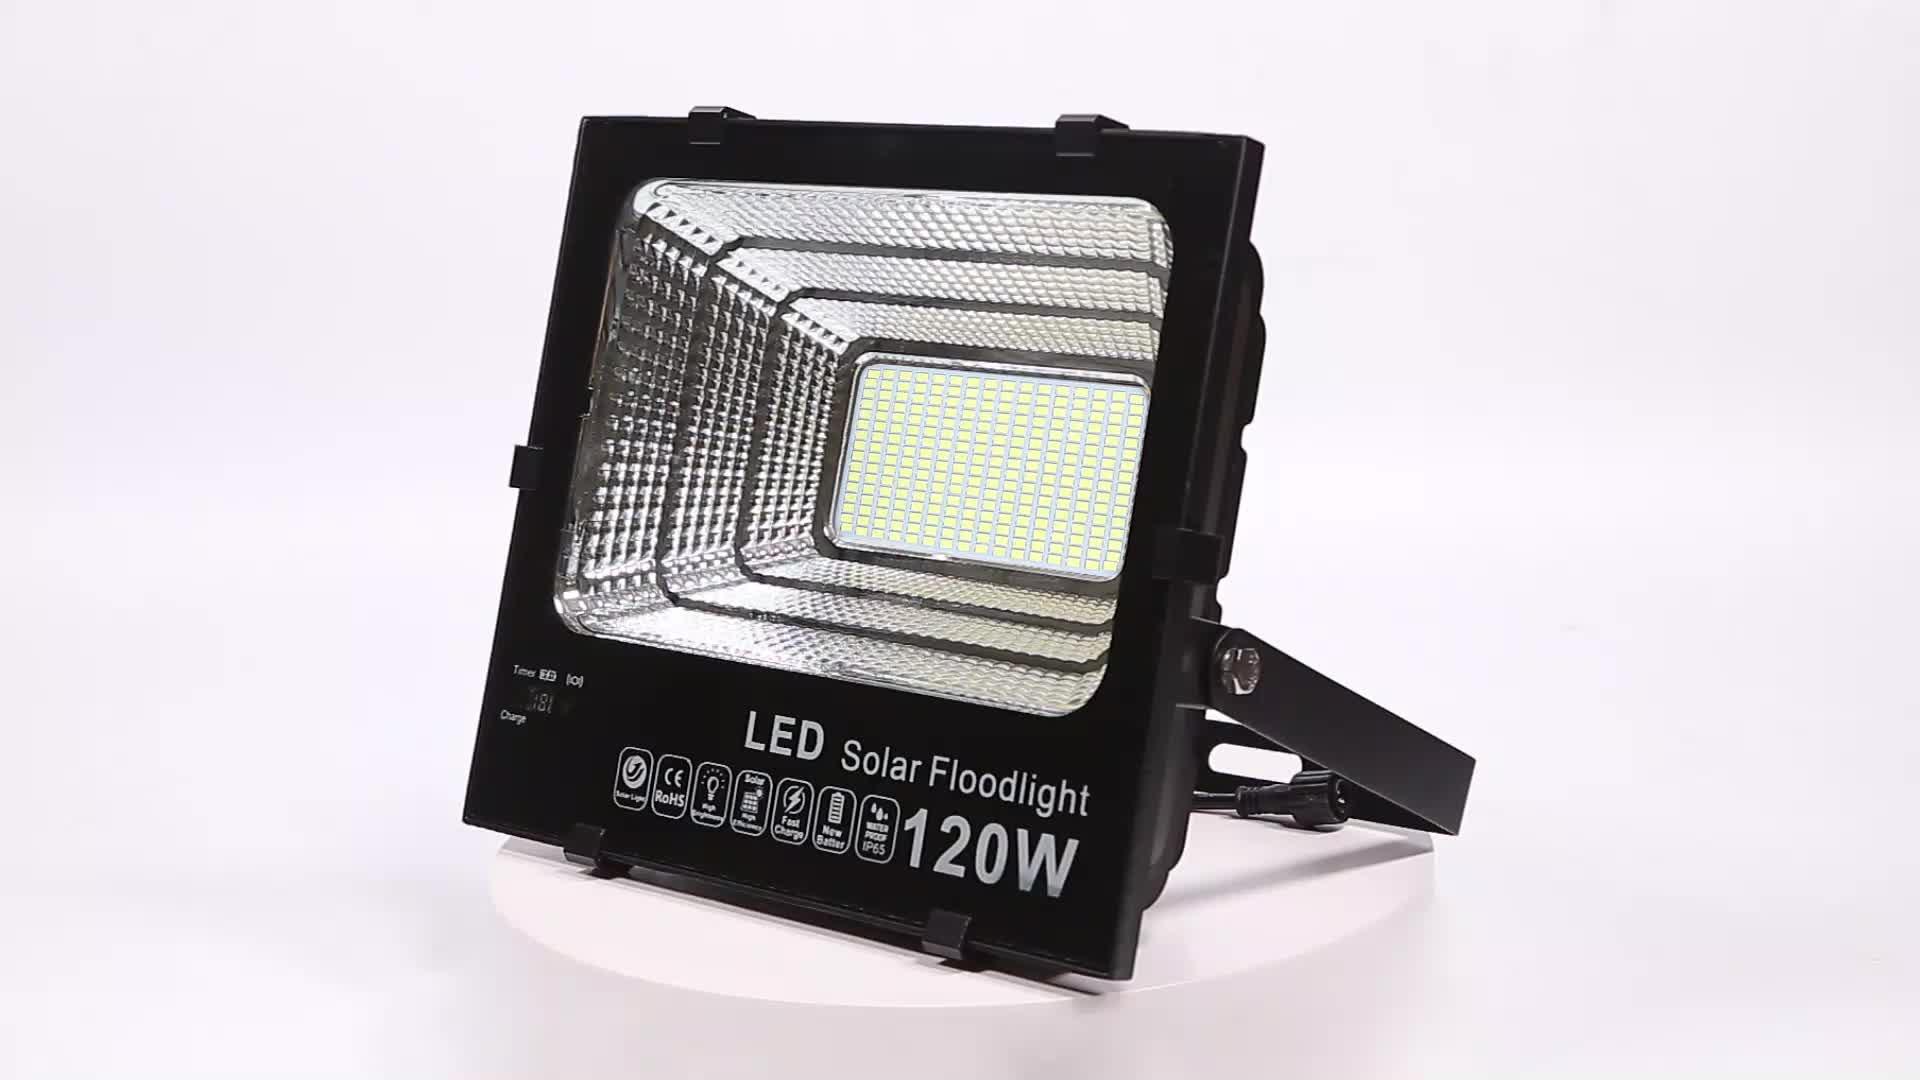 300W High Power Solar Spot Light Pathway Lamp Solar LED Flood Light for Outdoor use 3 Years Warranty